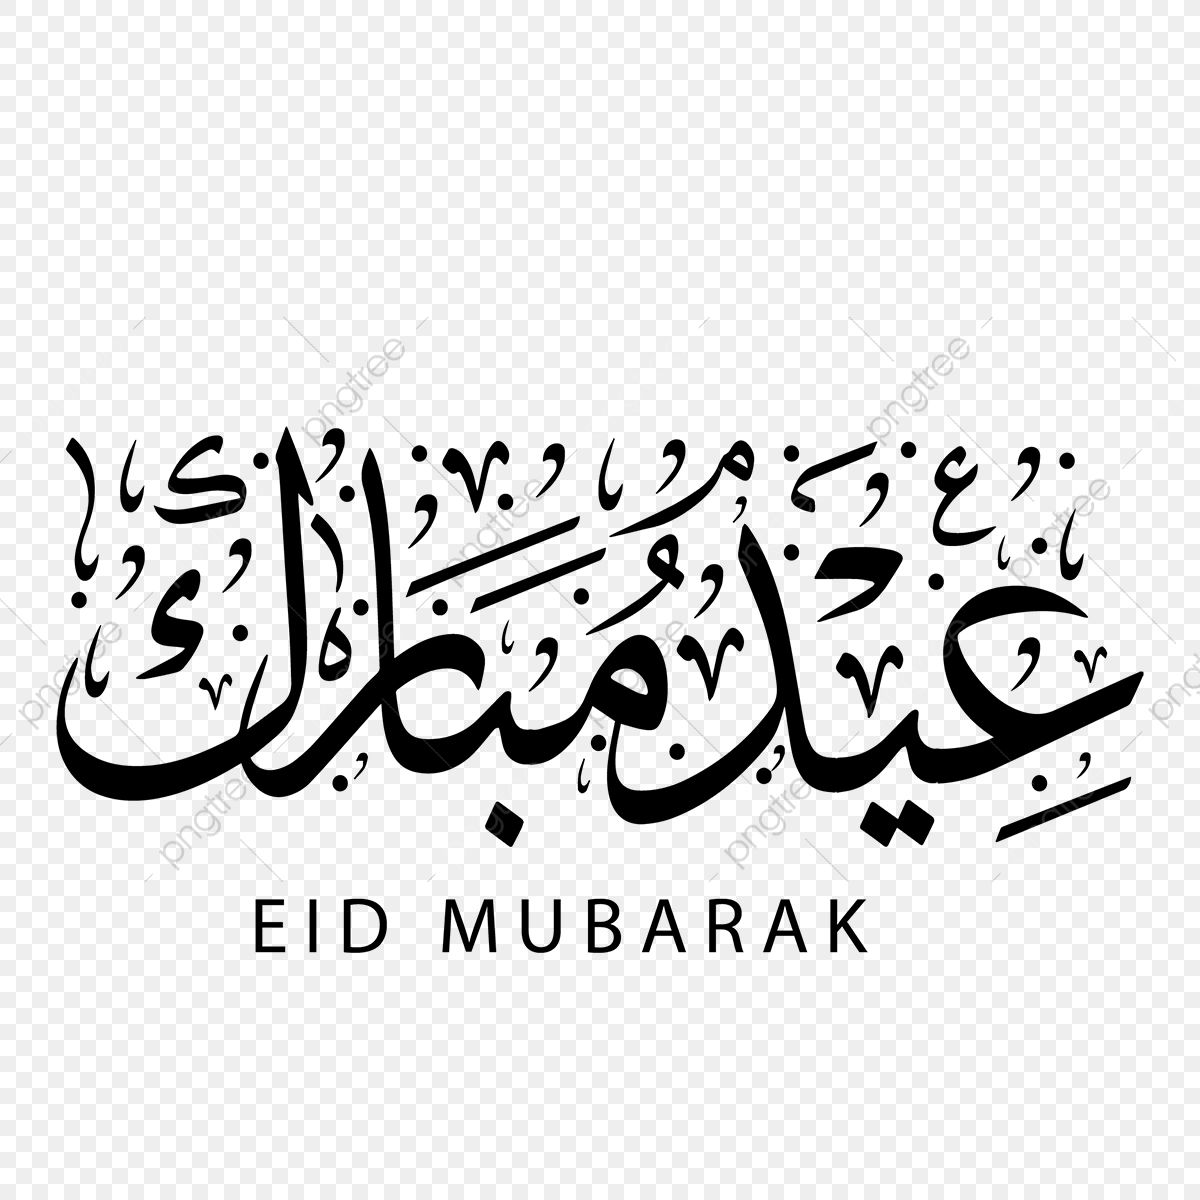 Eid Mubarak Calligraphy Eid Mubarak Words Idul Fitri Png And Vector With Transparent Background For Free Download In 2020 Eid Mubarak Happy Eid Ul Fitr Eid Mubarak Wishes